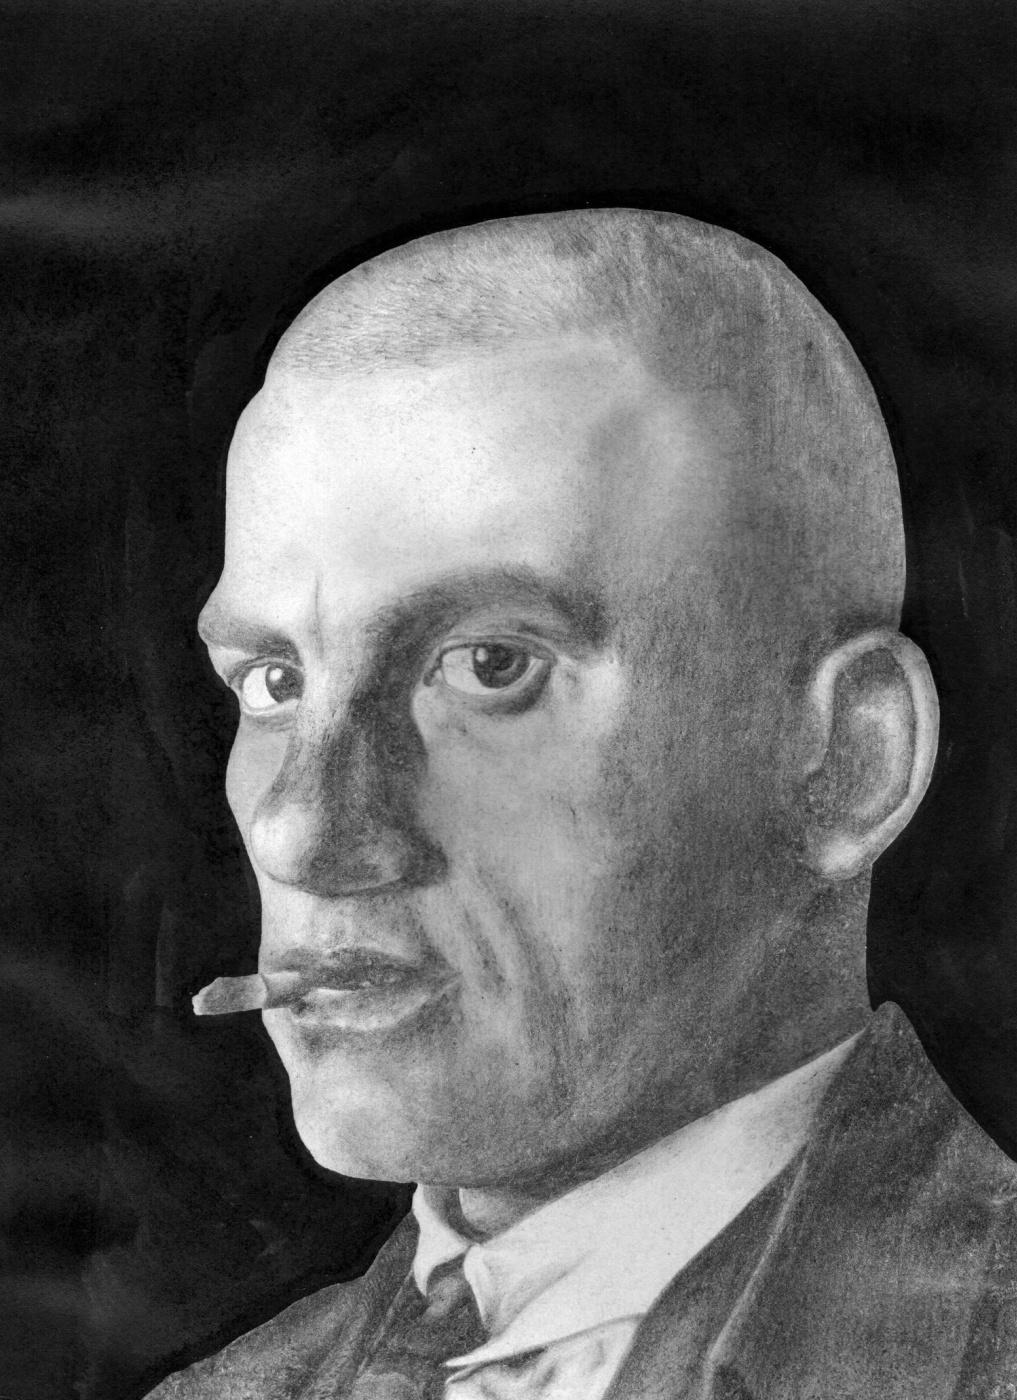 Vladimir Vasilyevich Abaimov. Vladimir Mayakovsky